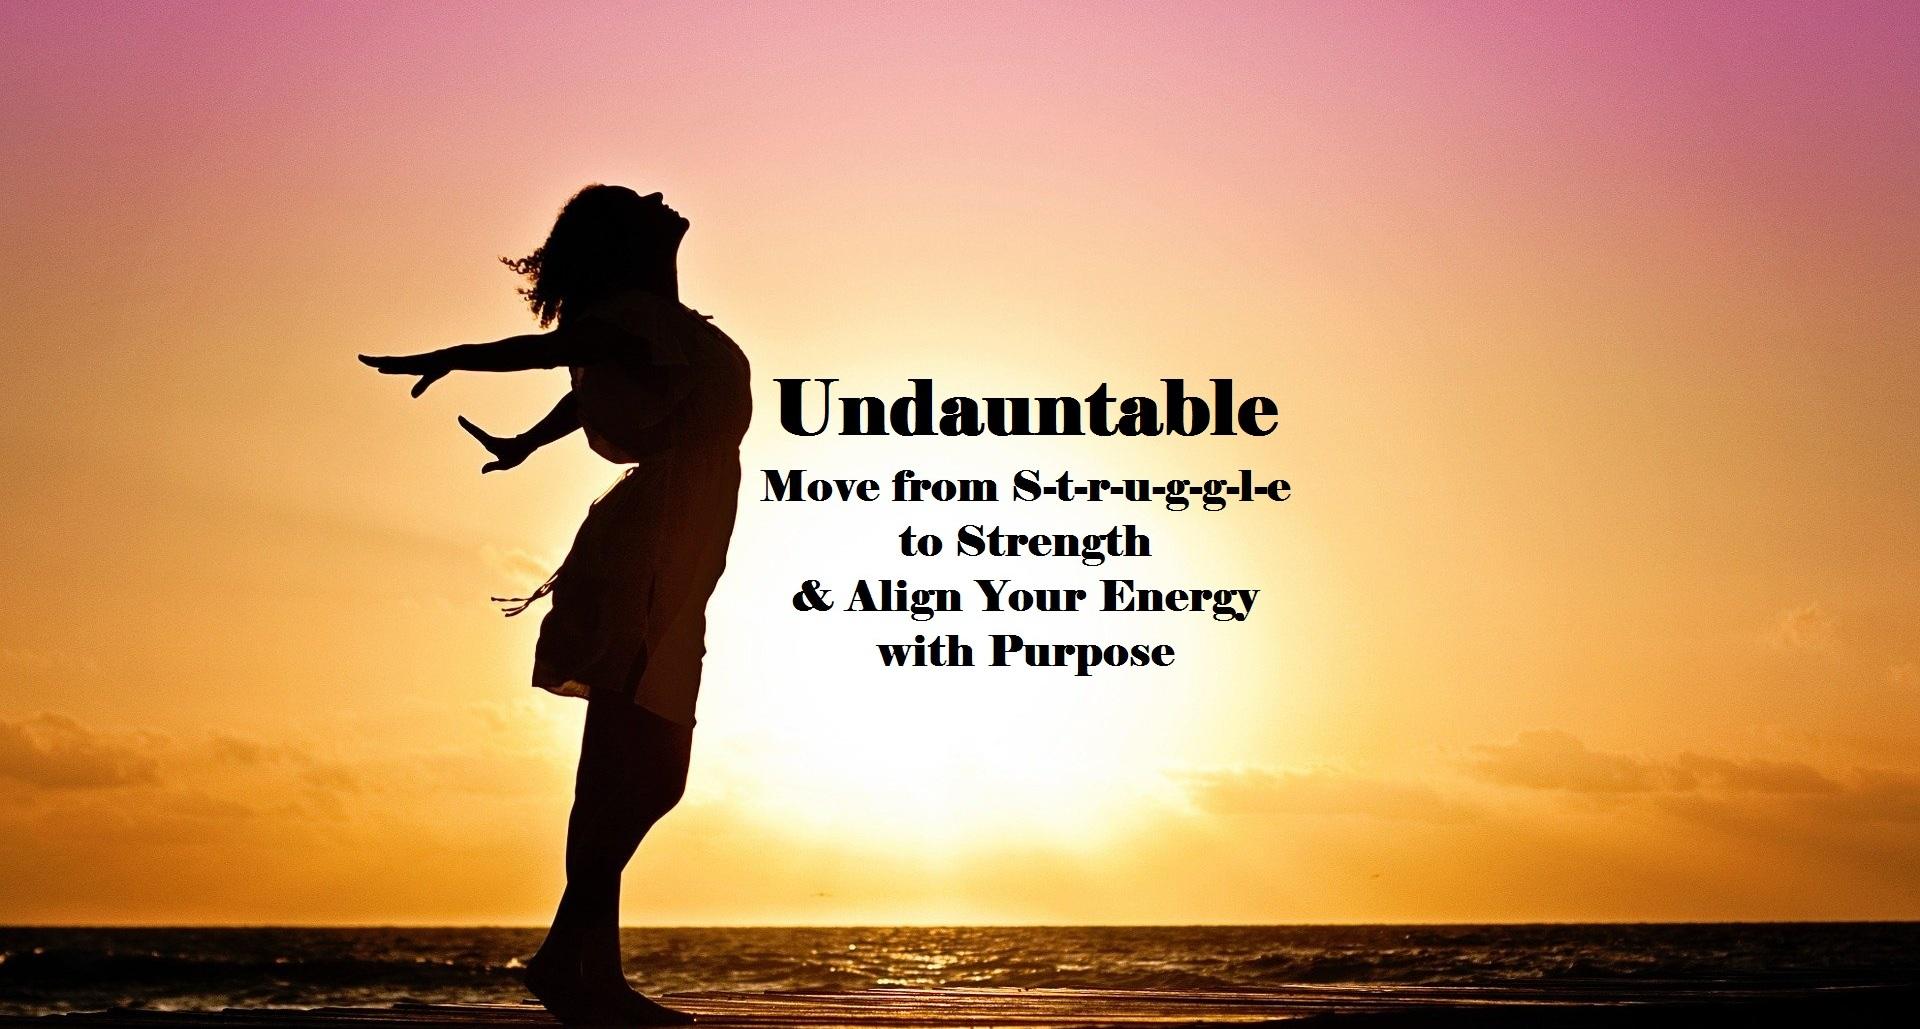 Undauntable